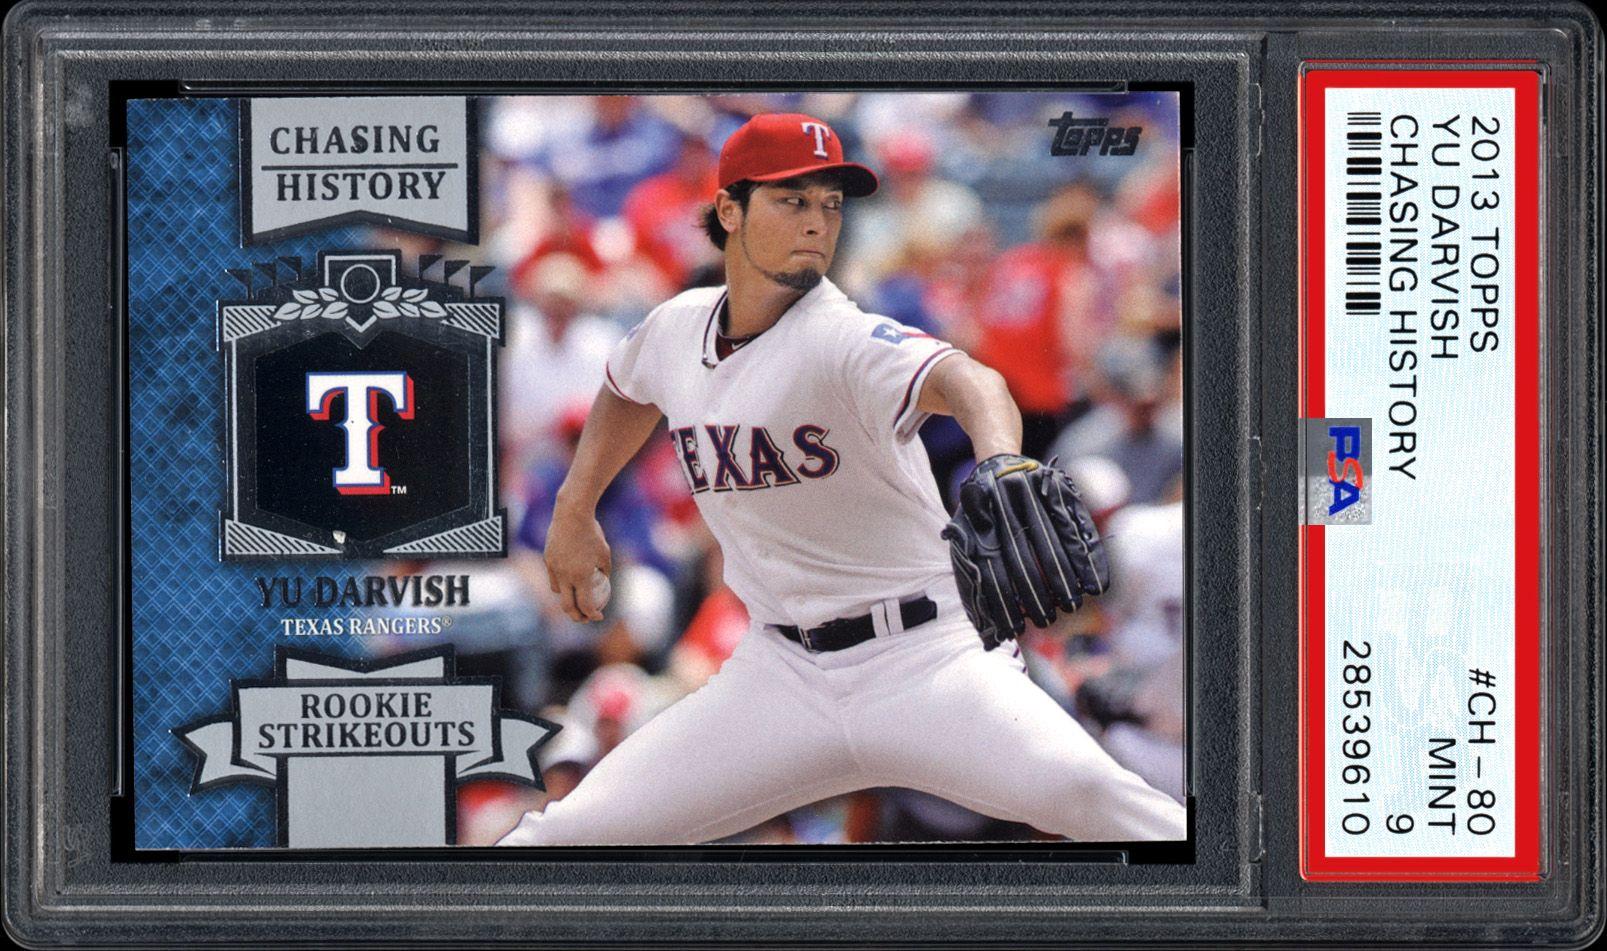 Baseball Cards 2013 Topps Chasing History Psa Cardfacts